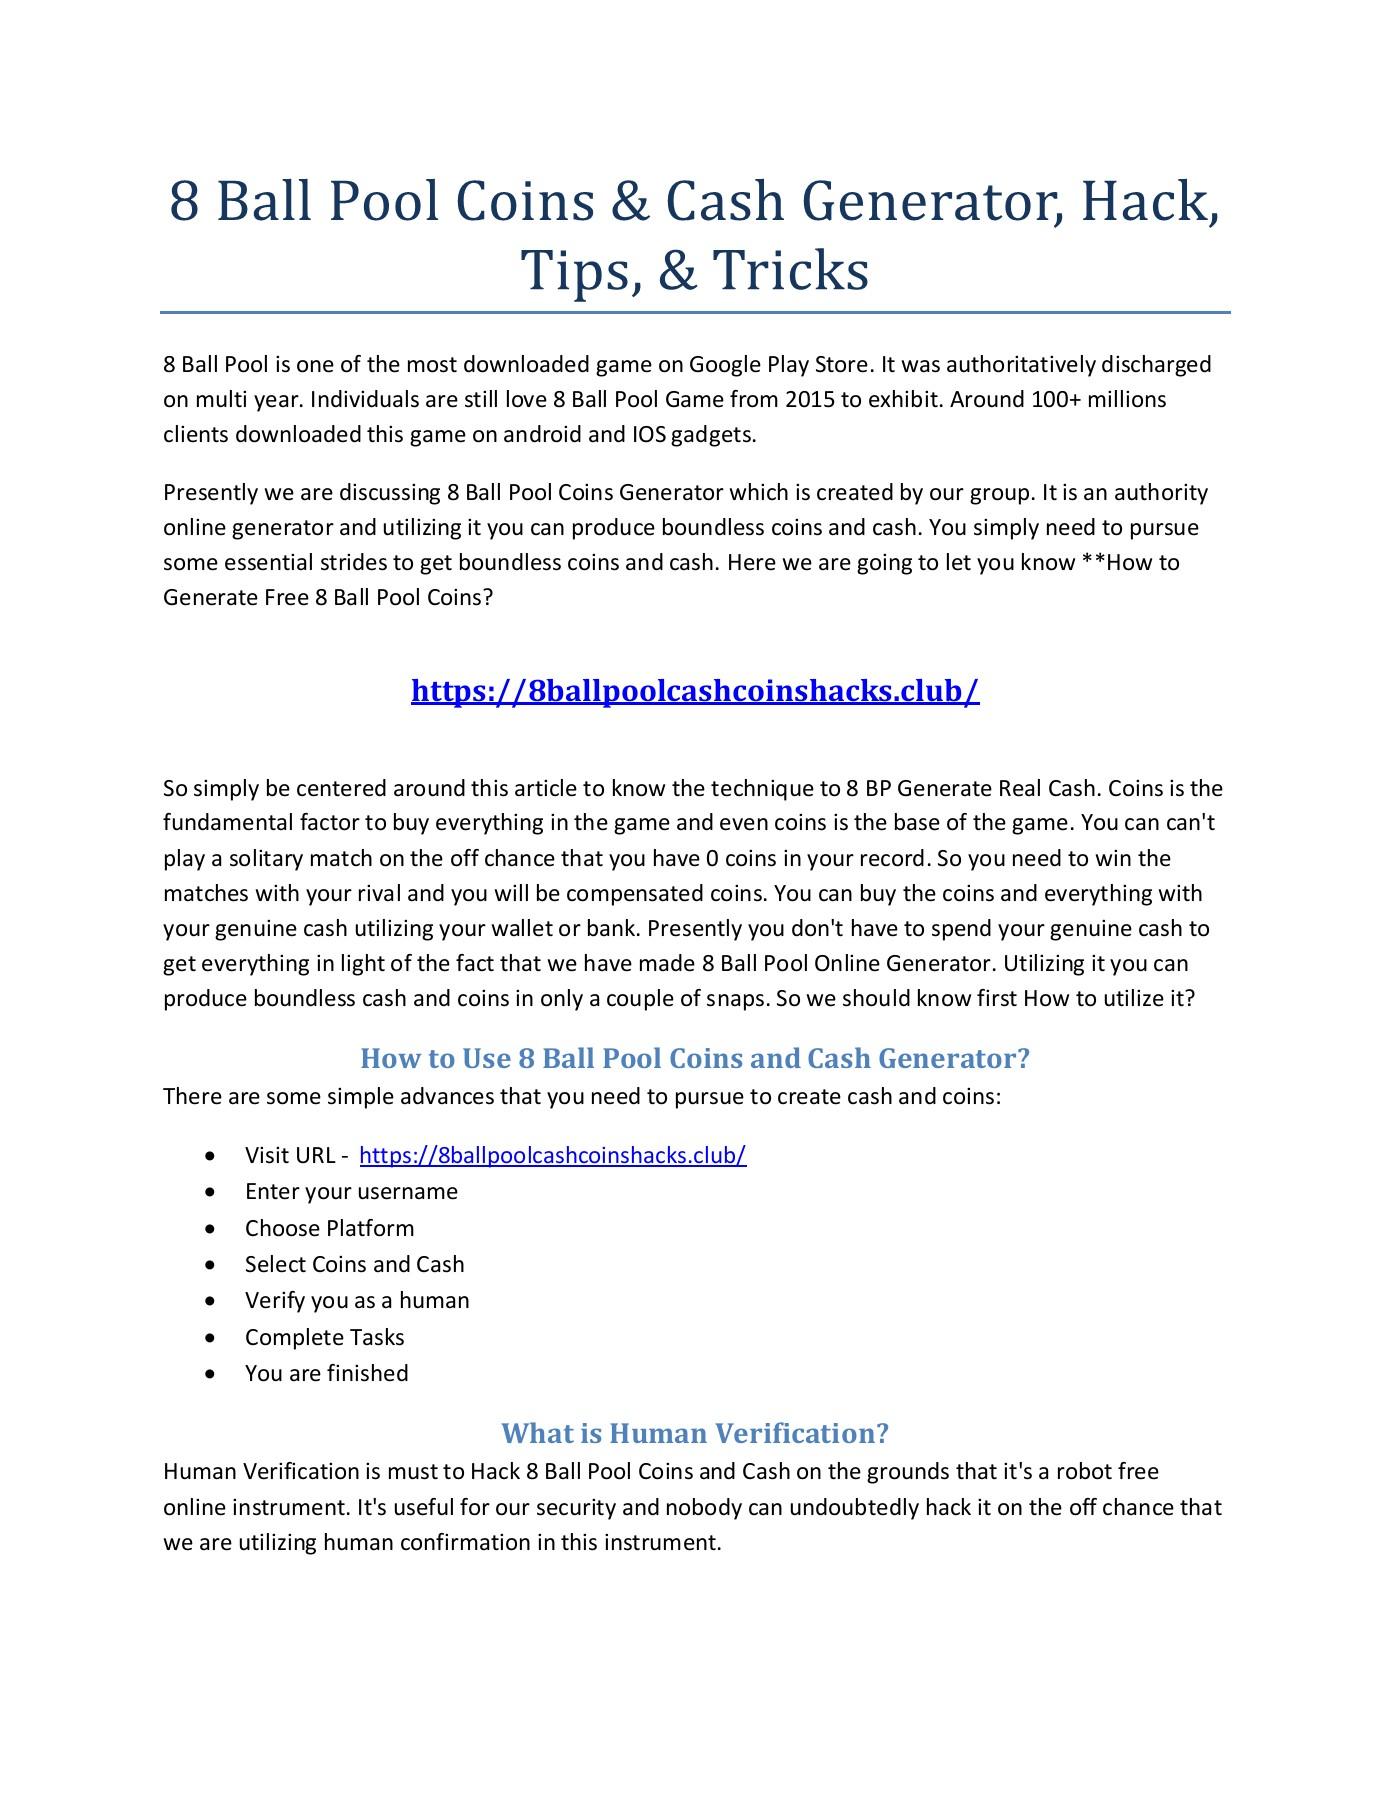 8 Ball Pool Coin Generator Online 8 ball pool coins & cash generator, hack, tips, & tricks